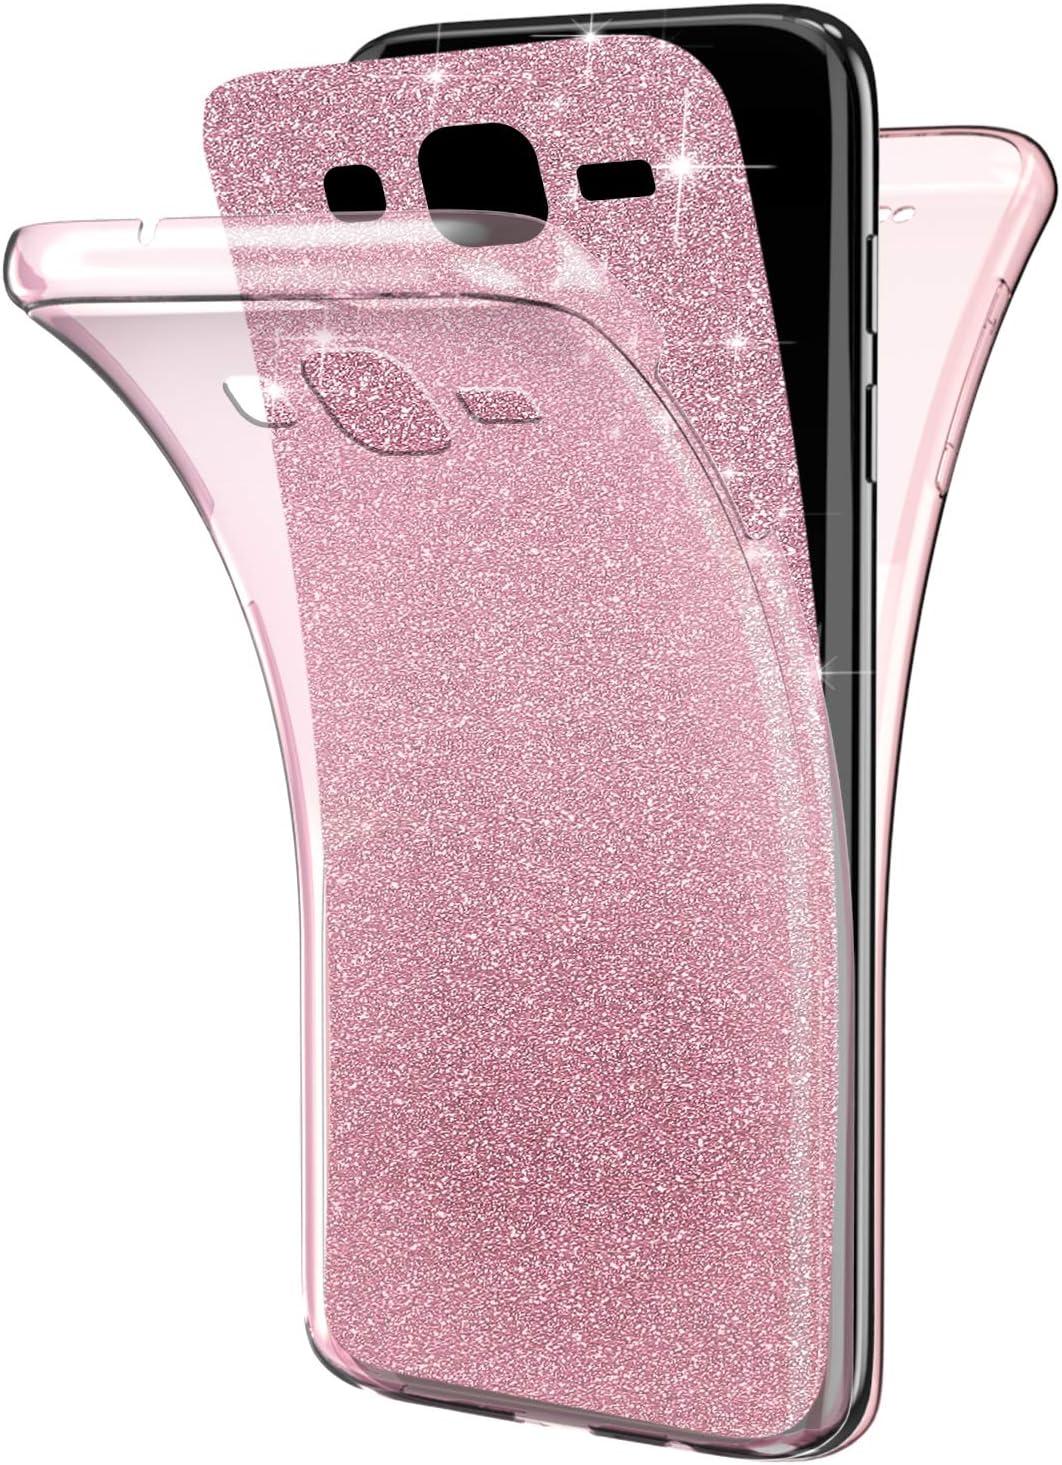 Ysimee Coque Samsung Galaxy Core Prime G360, Silicone ...